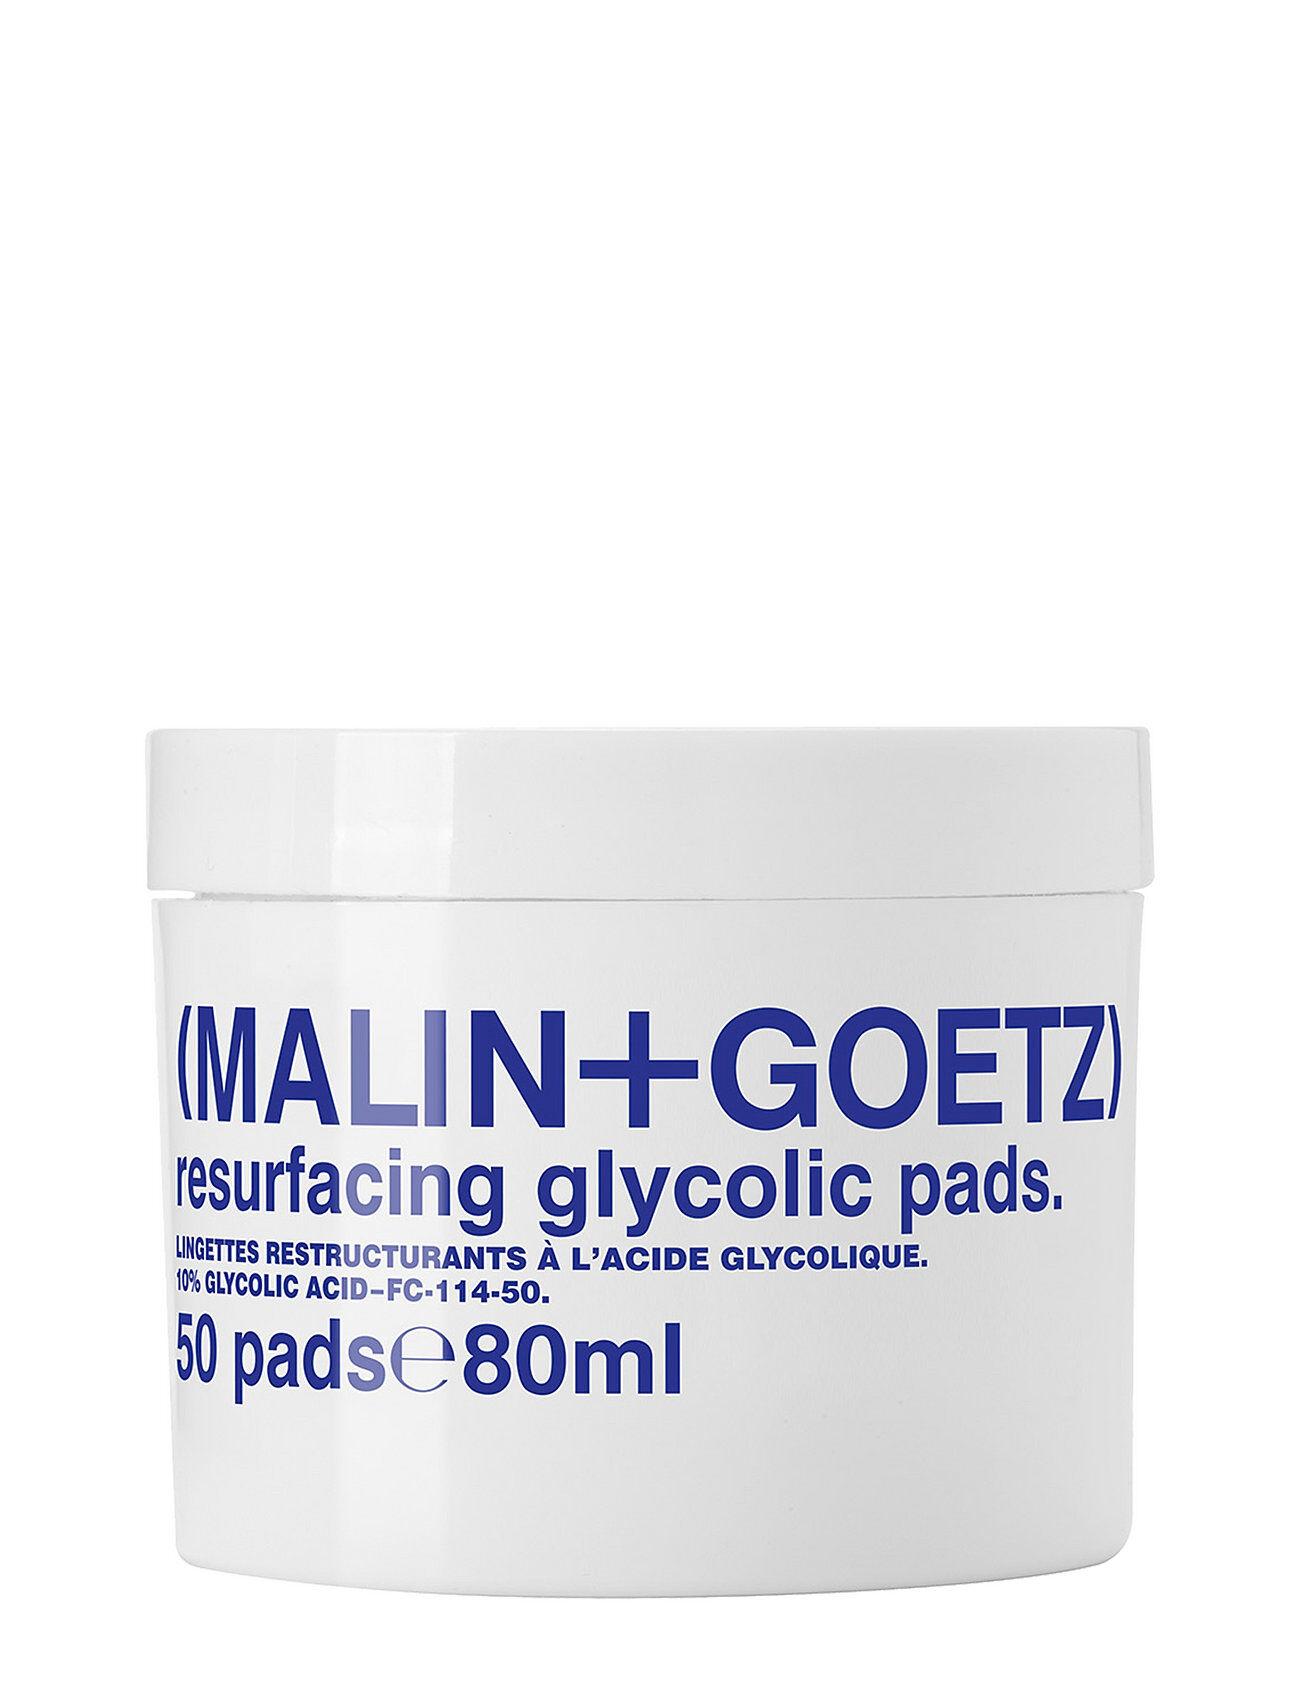 MALIN+GOETZ Resurfacing Glycolic Pads Kasvojen Ihonhoito Nude MALIN+GOETZ